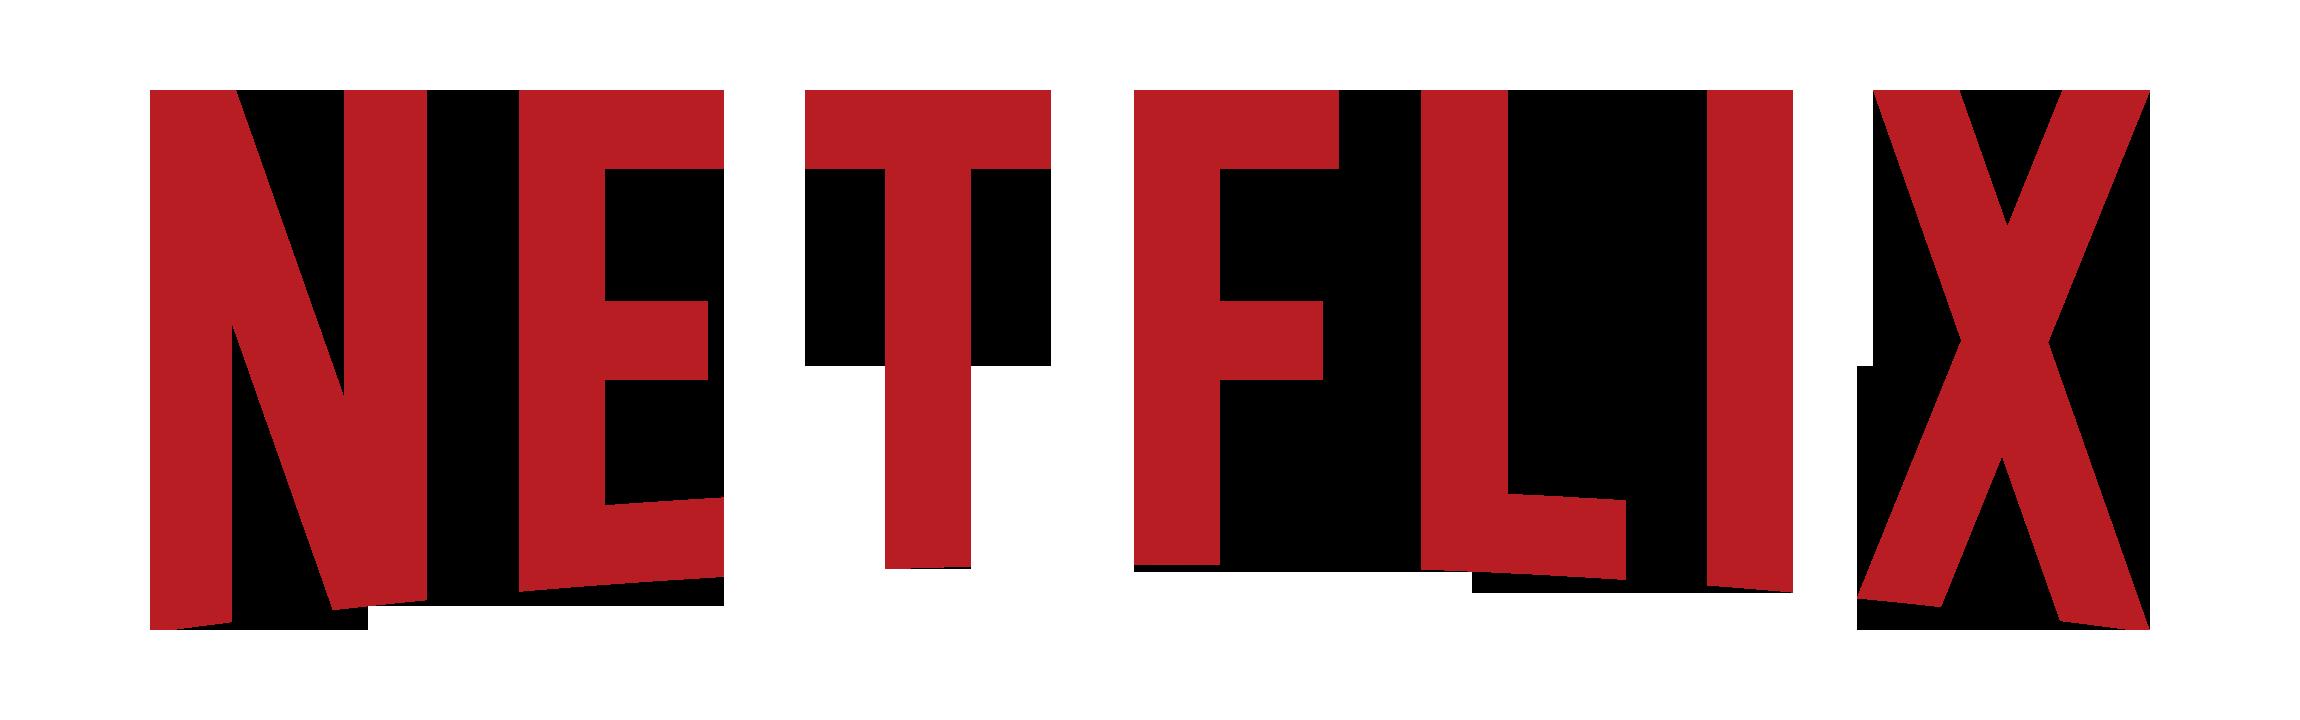 2017-11-01-netflix-logo.png